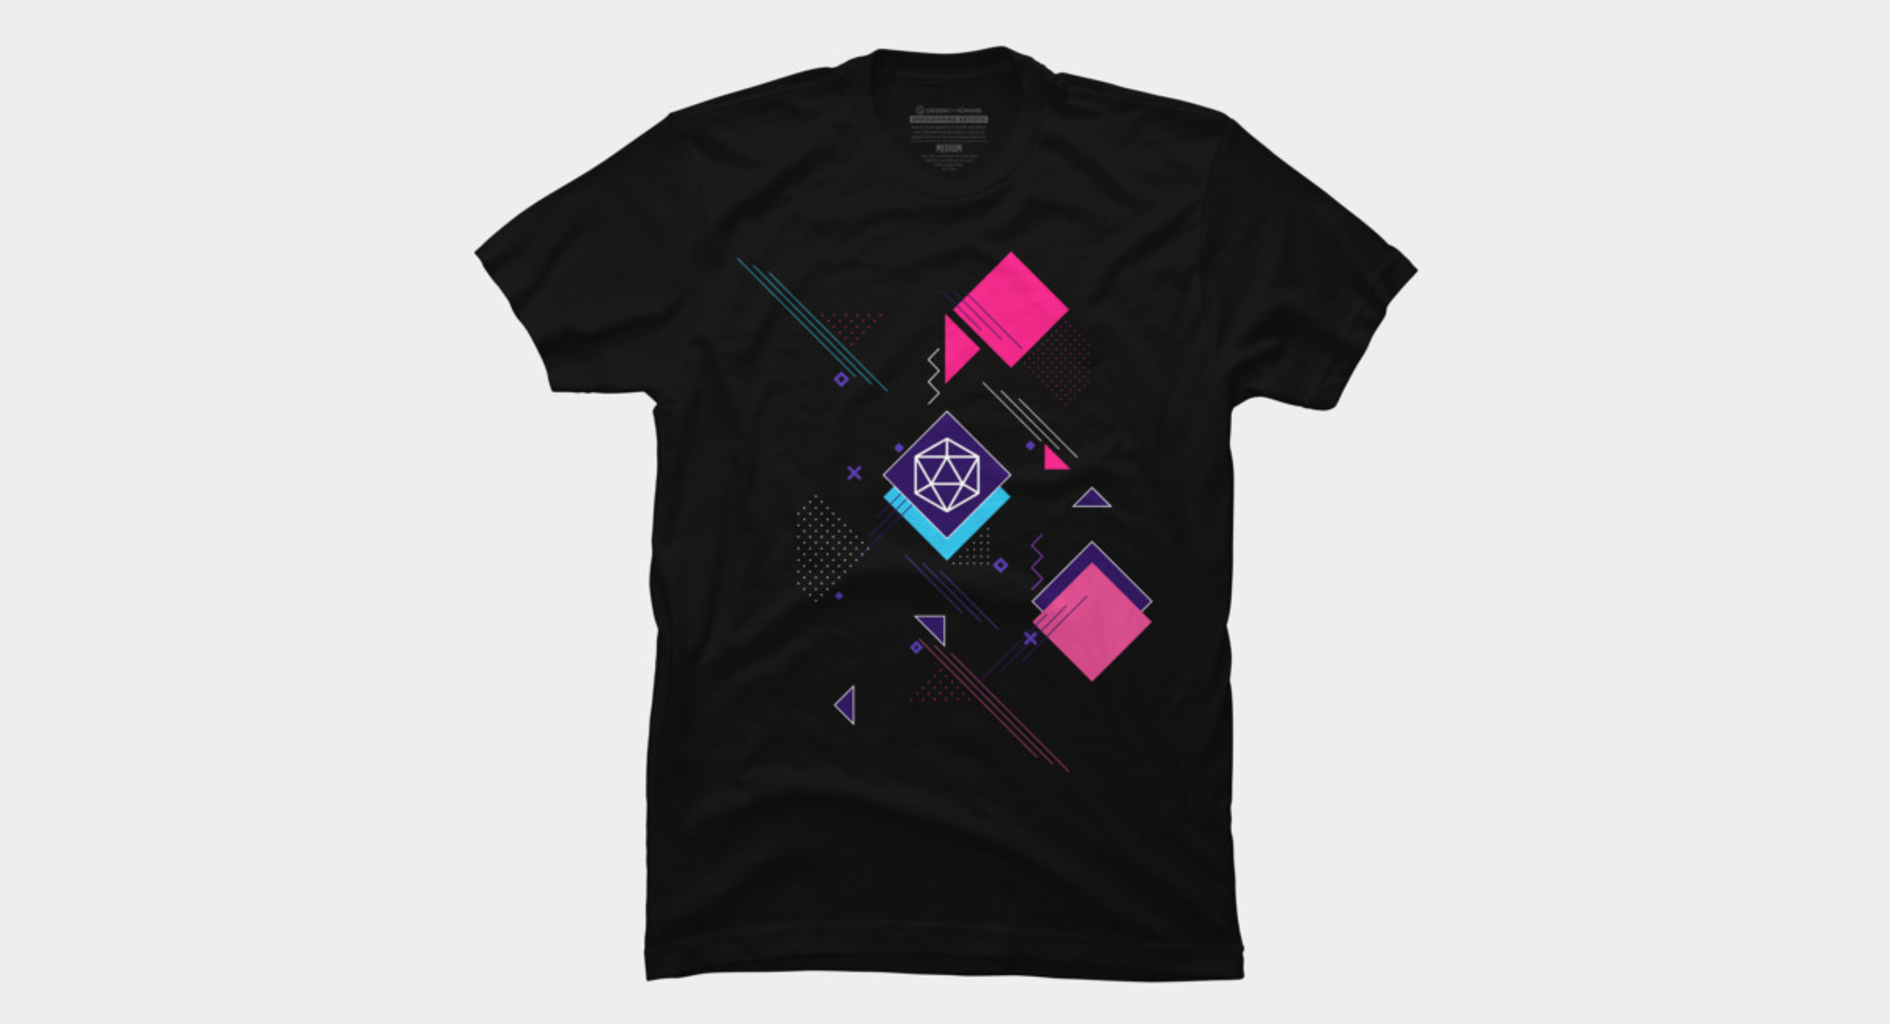 Design by Humans: Cyberpunk Neon Noir D20 Dice Geometric